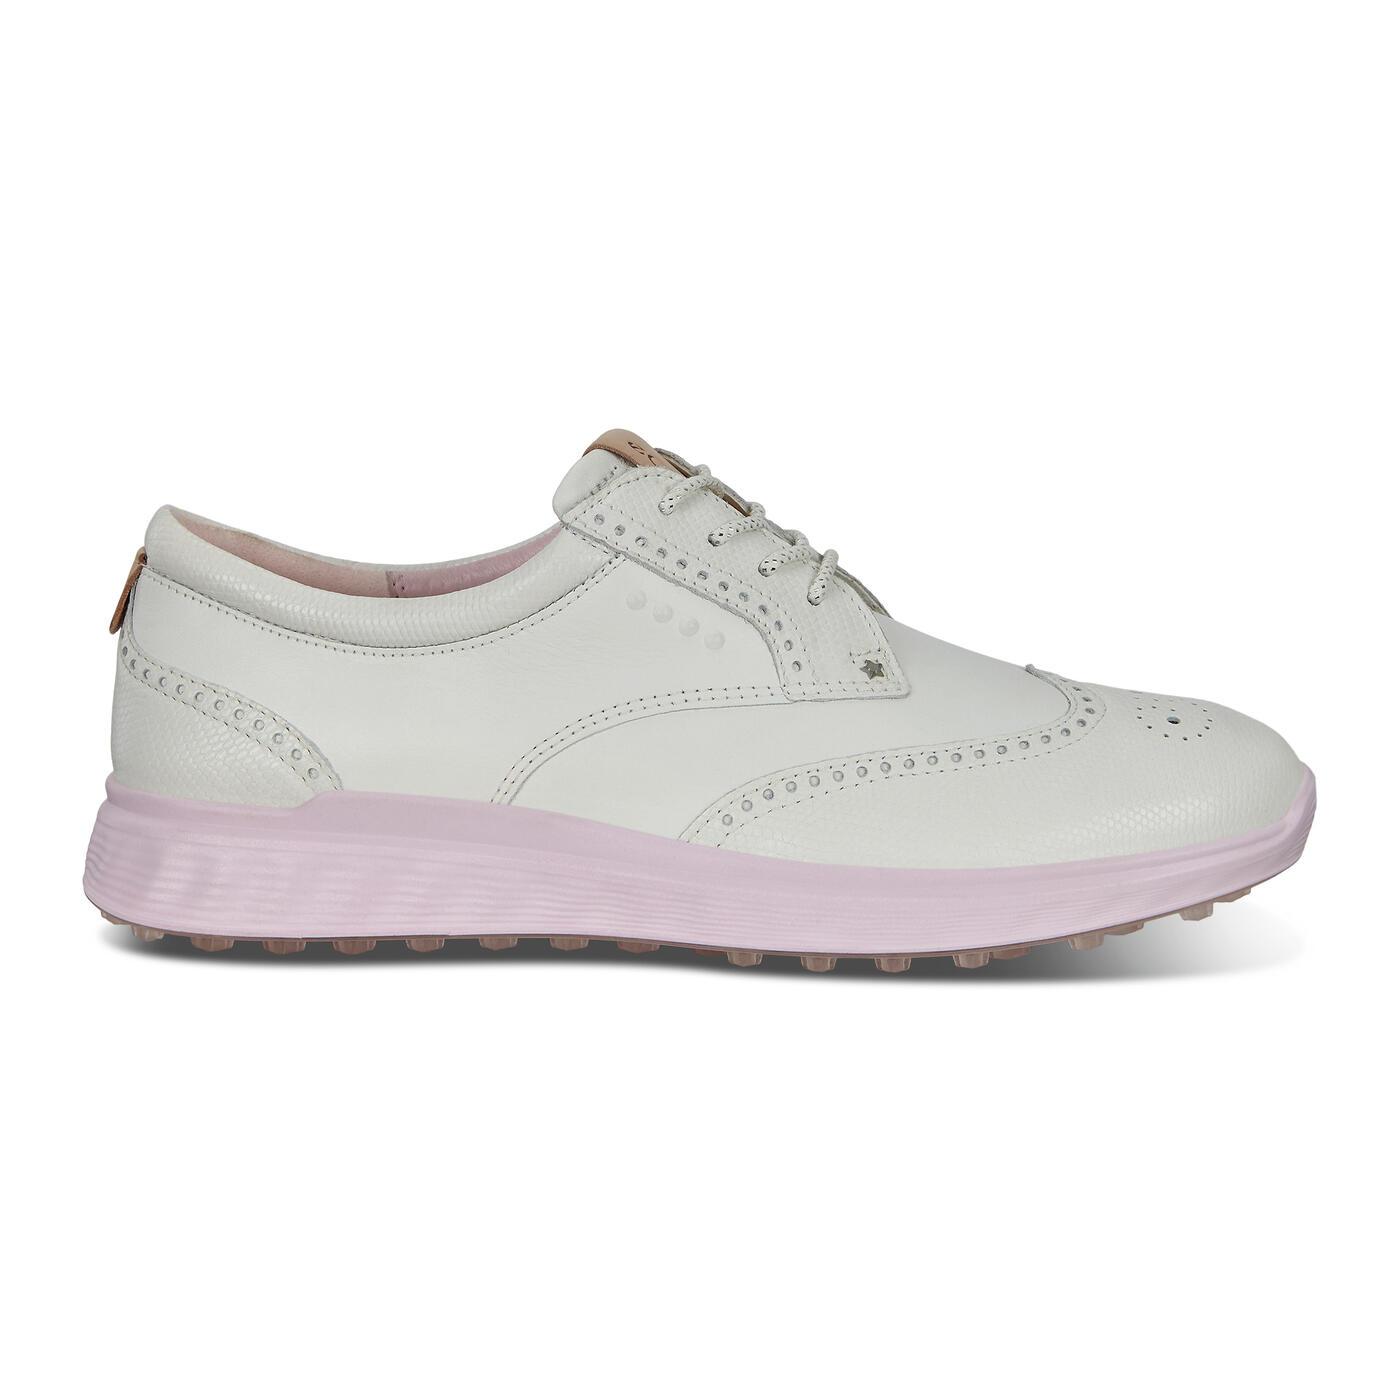 ECCO Women's Spikeless Golf S-Classic Shoes